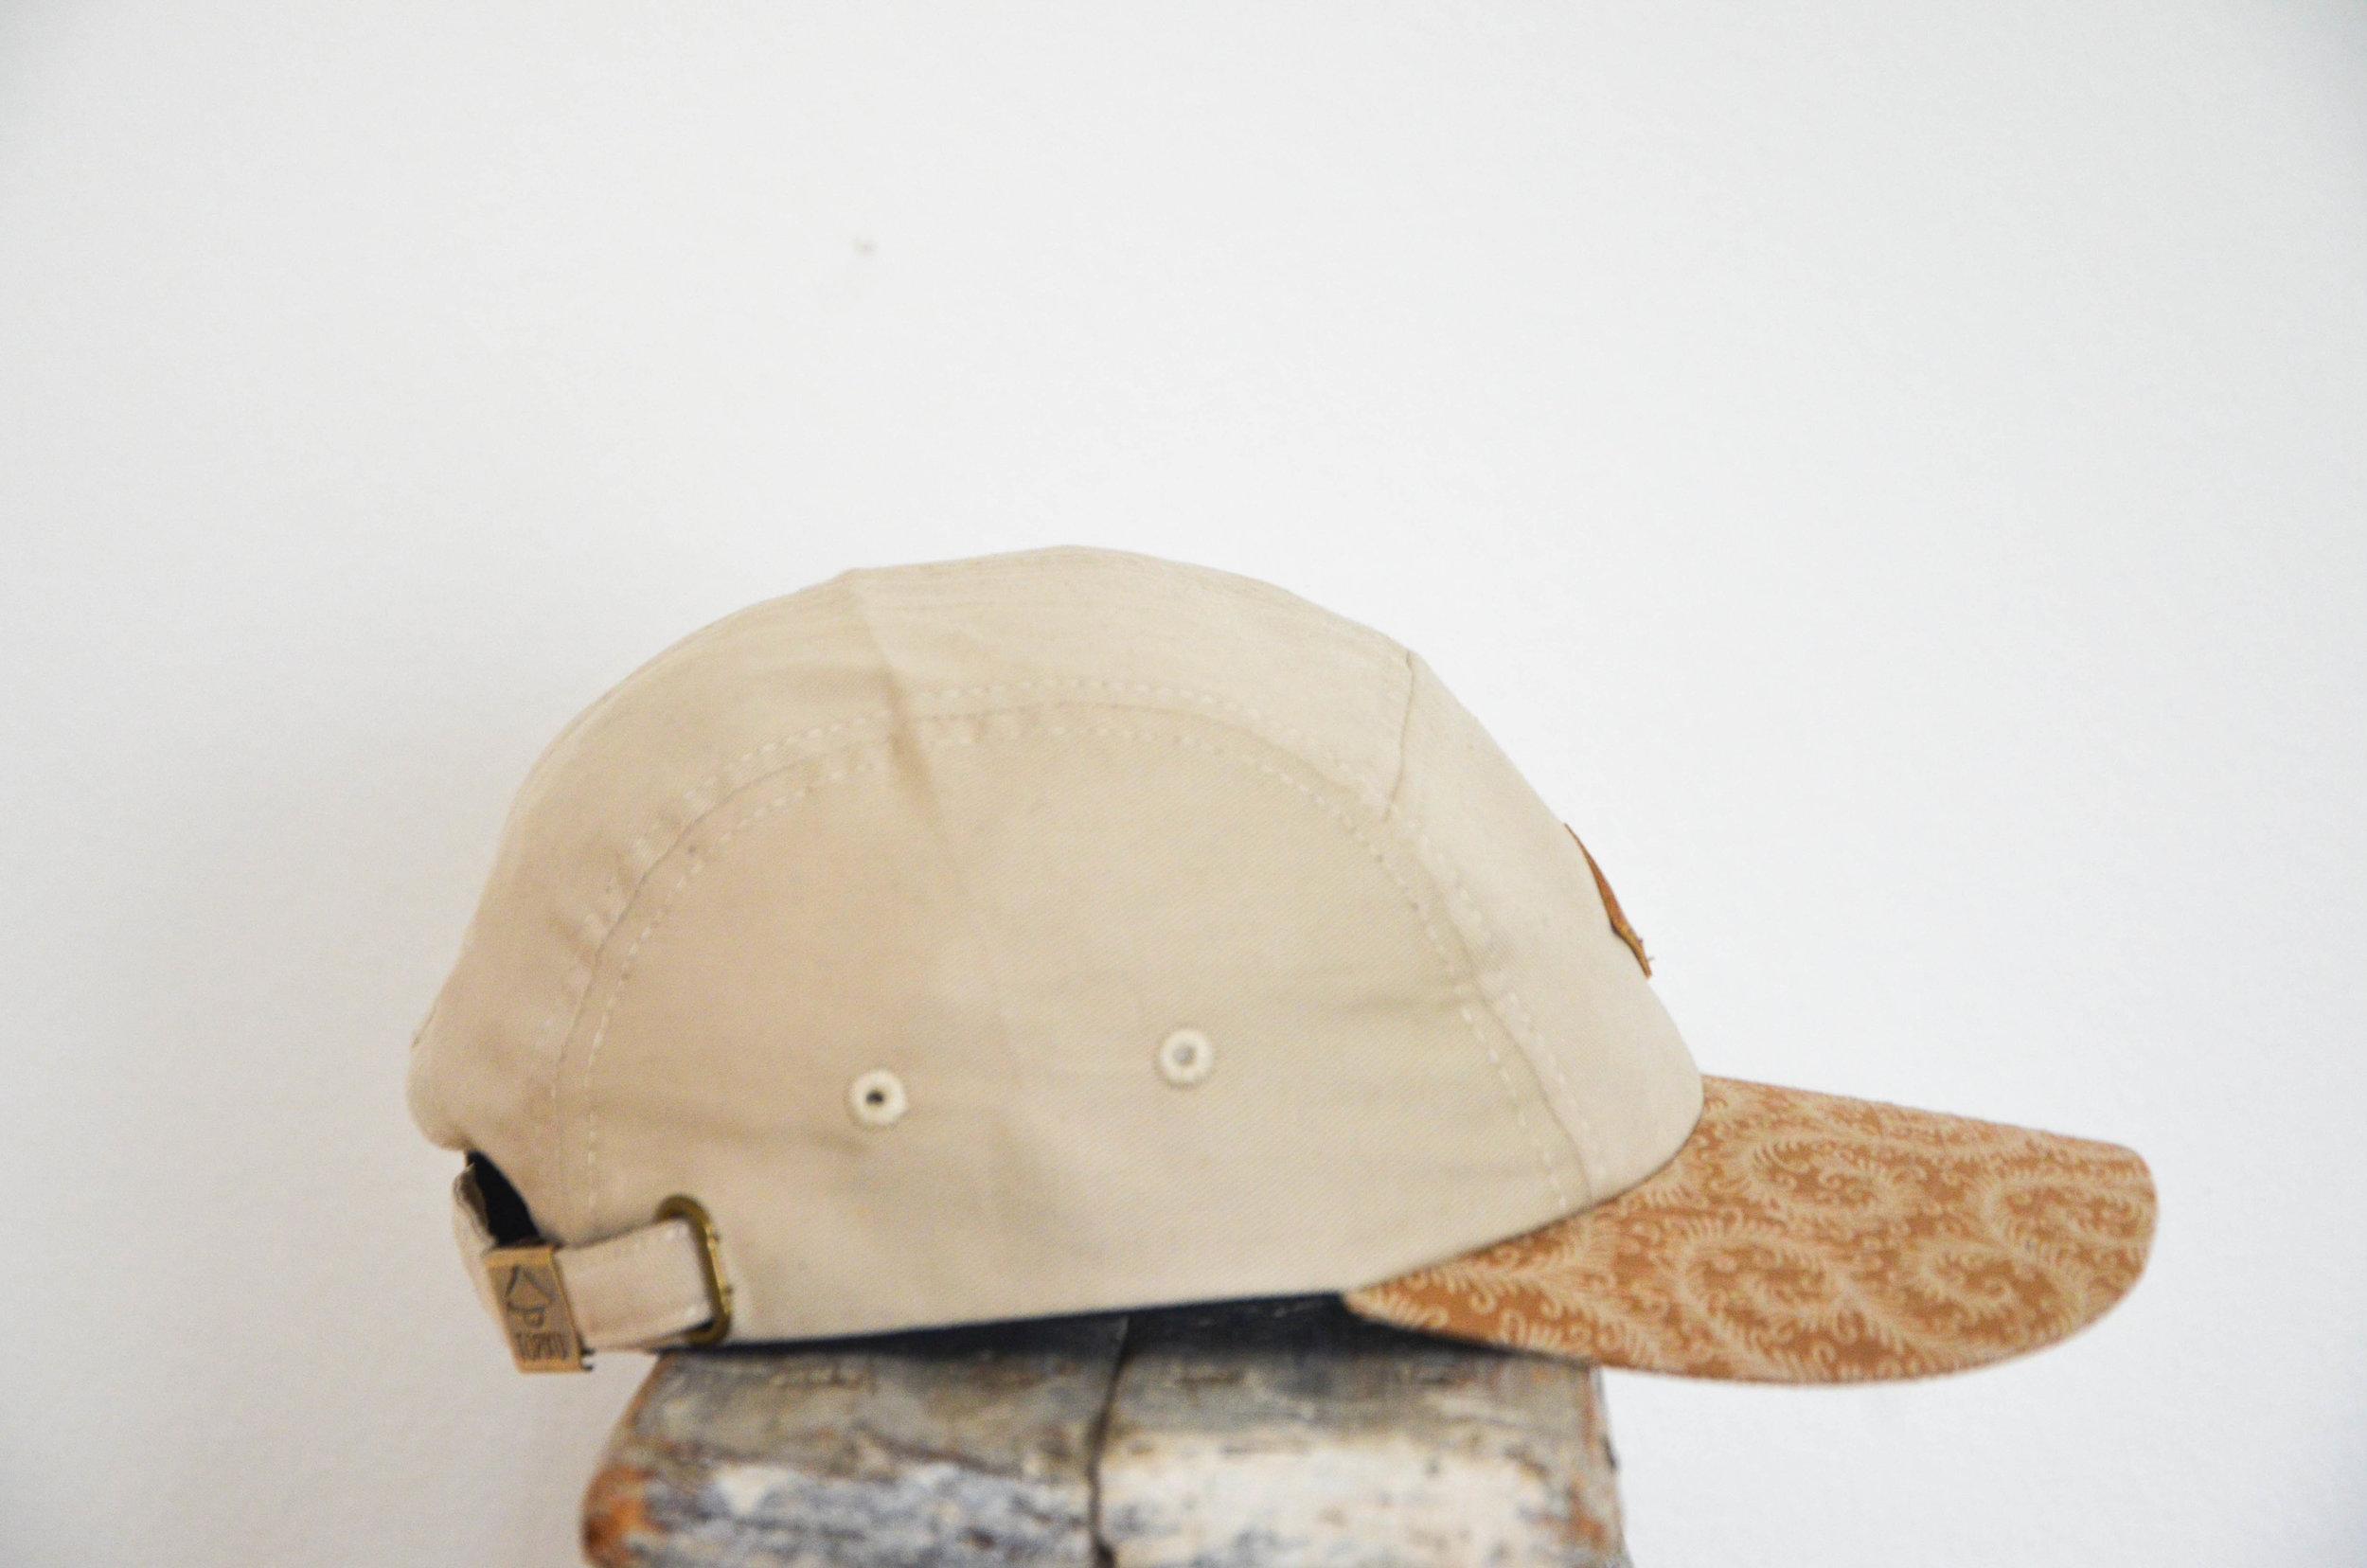 #THEHIGH5 - 5-PANEL SNAPBACK CAP